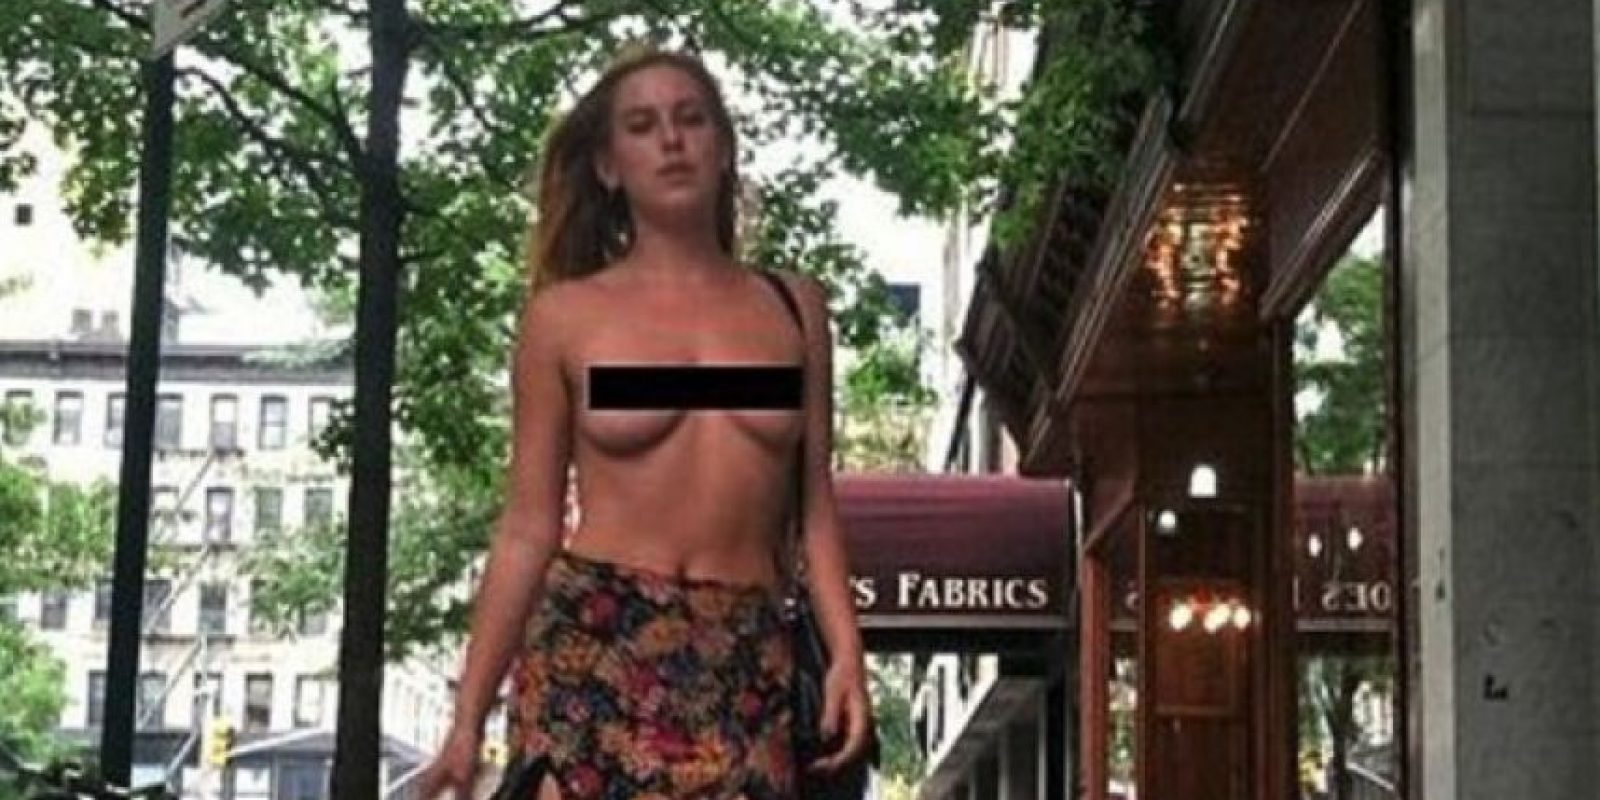 En junio de 2014, Scout Willis causó gran polémica cuando salió a la calle en topless, para manifestarse a favor de la equidad de género. Foto:Twitter/Scout_Willis